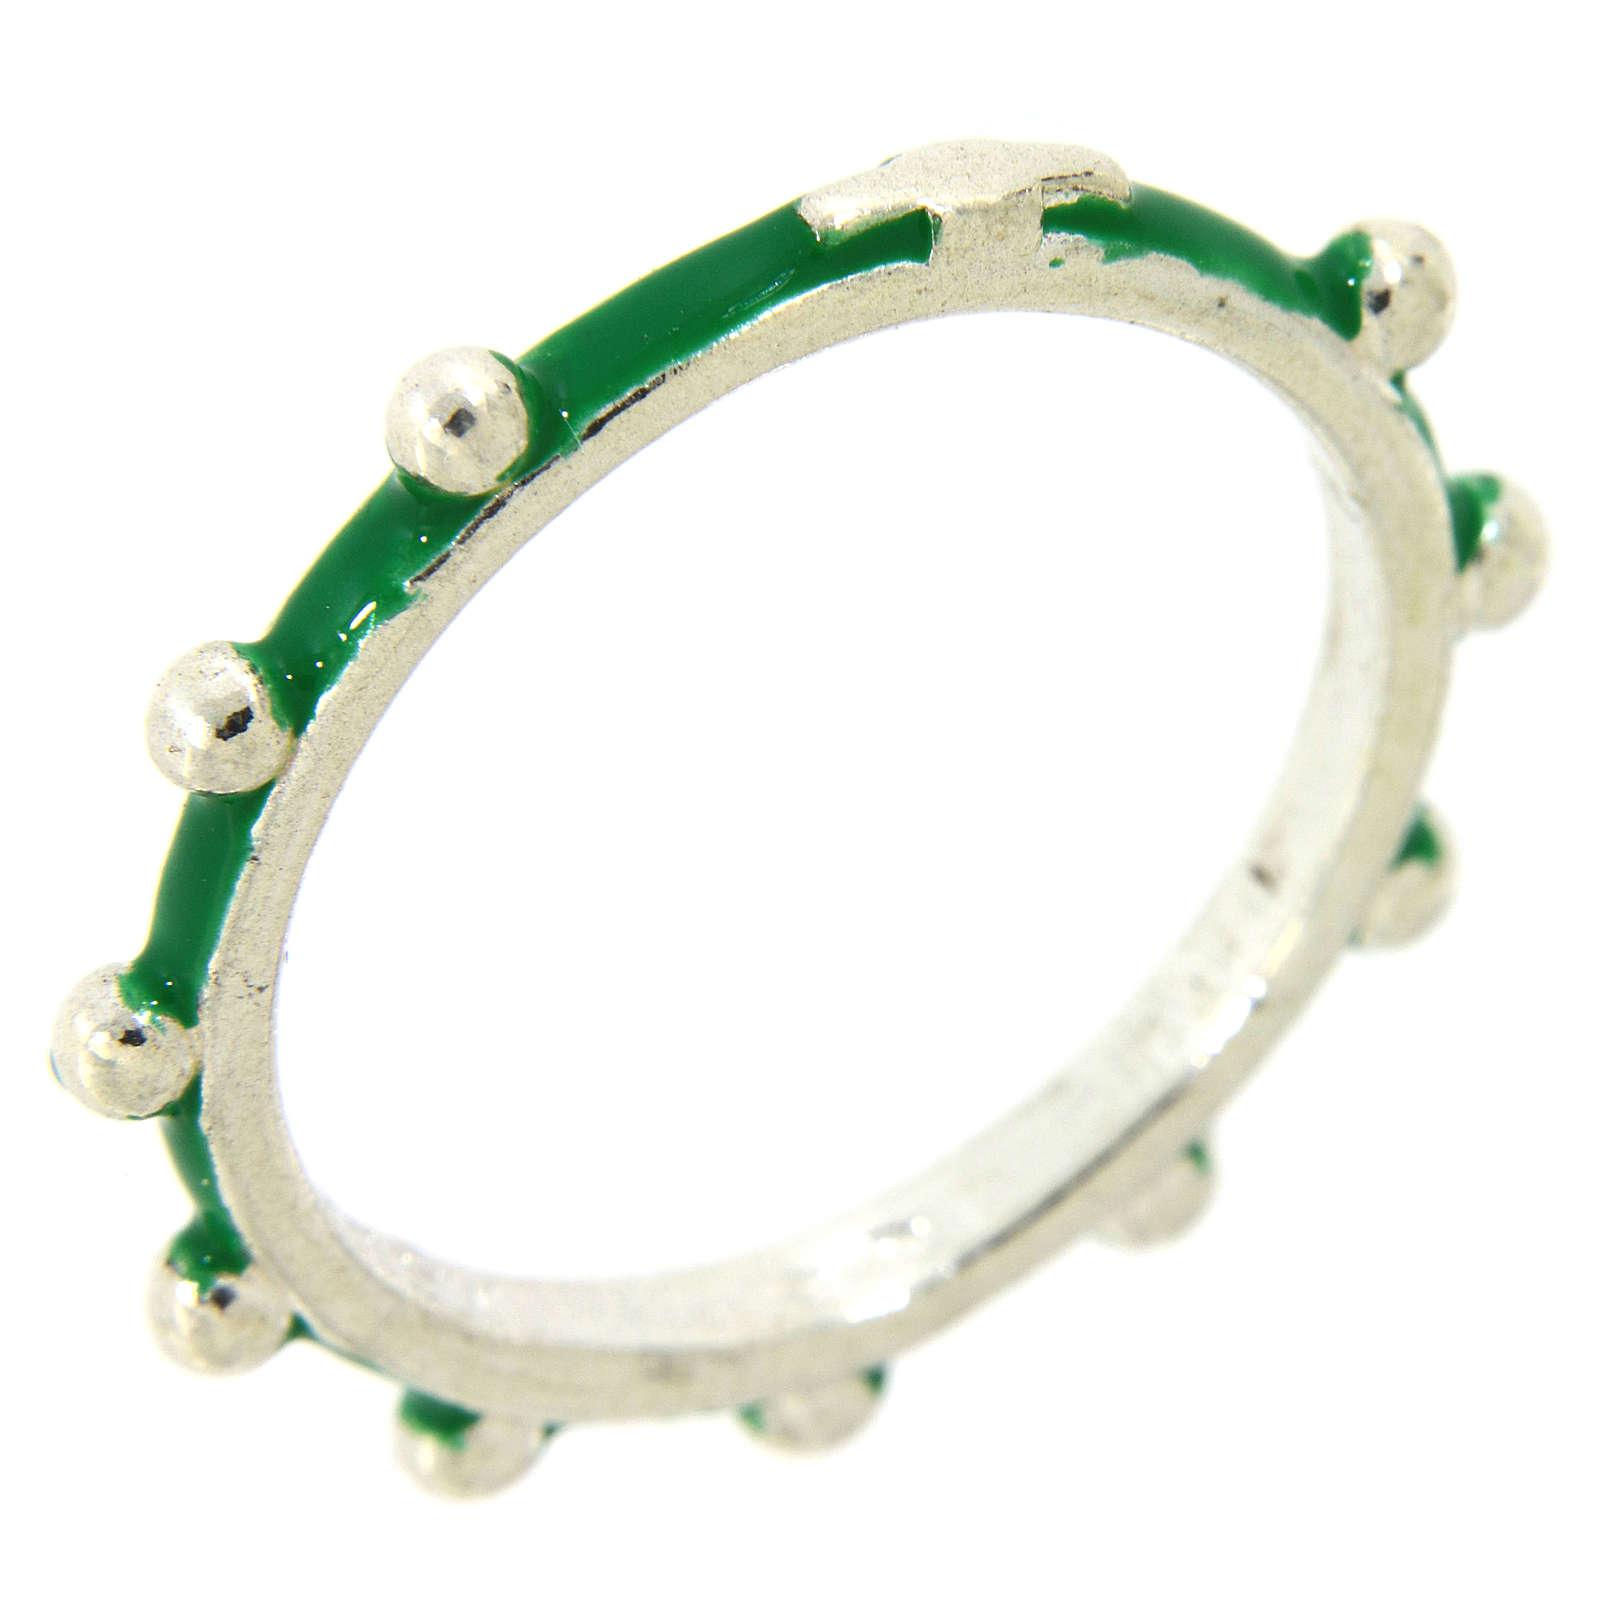 Obrączka różaniec MATER emaliowana zielona srebro 925 3